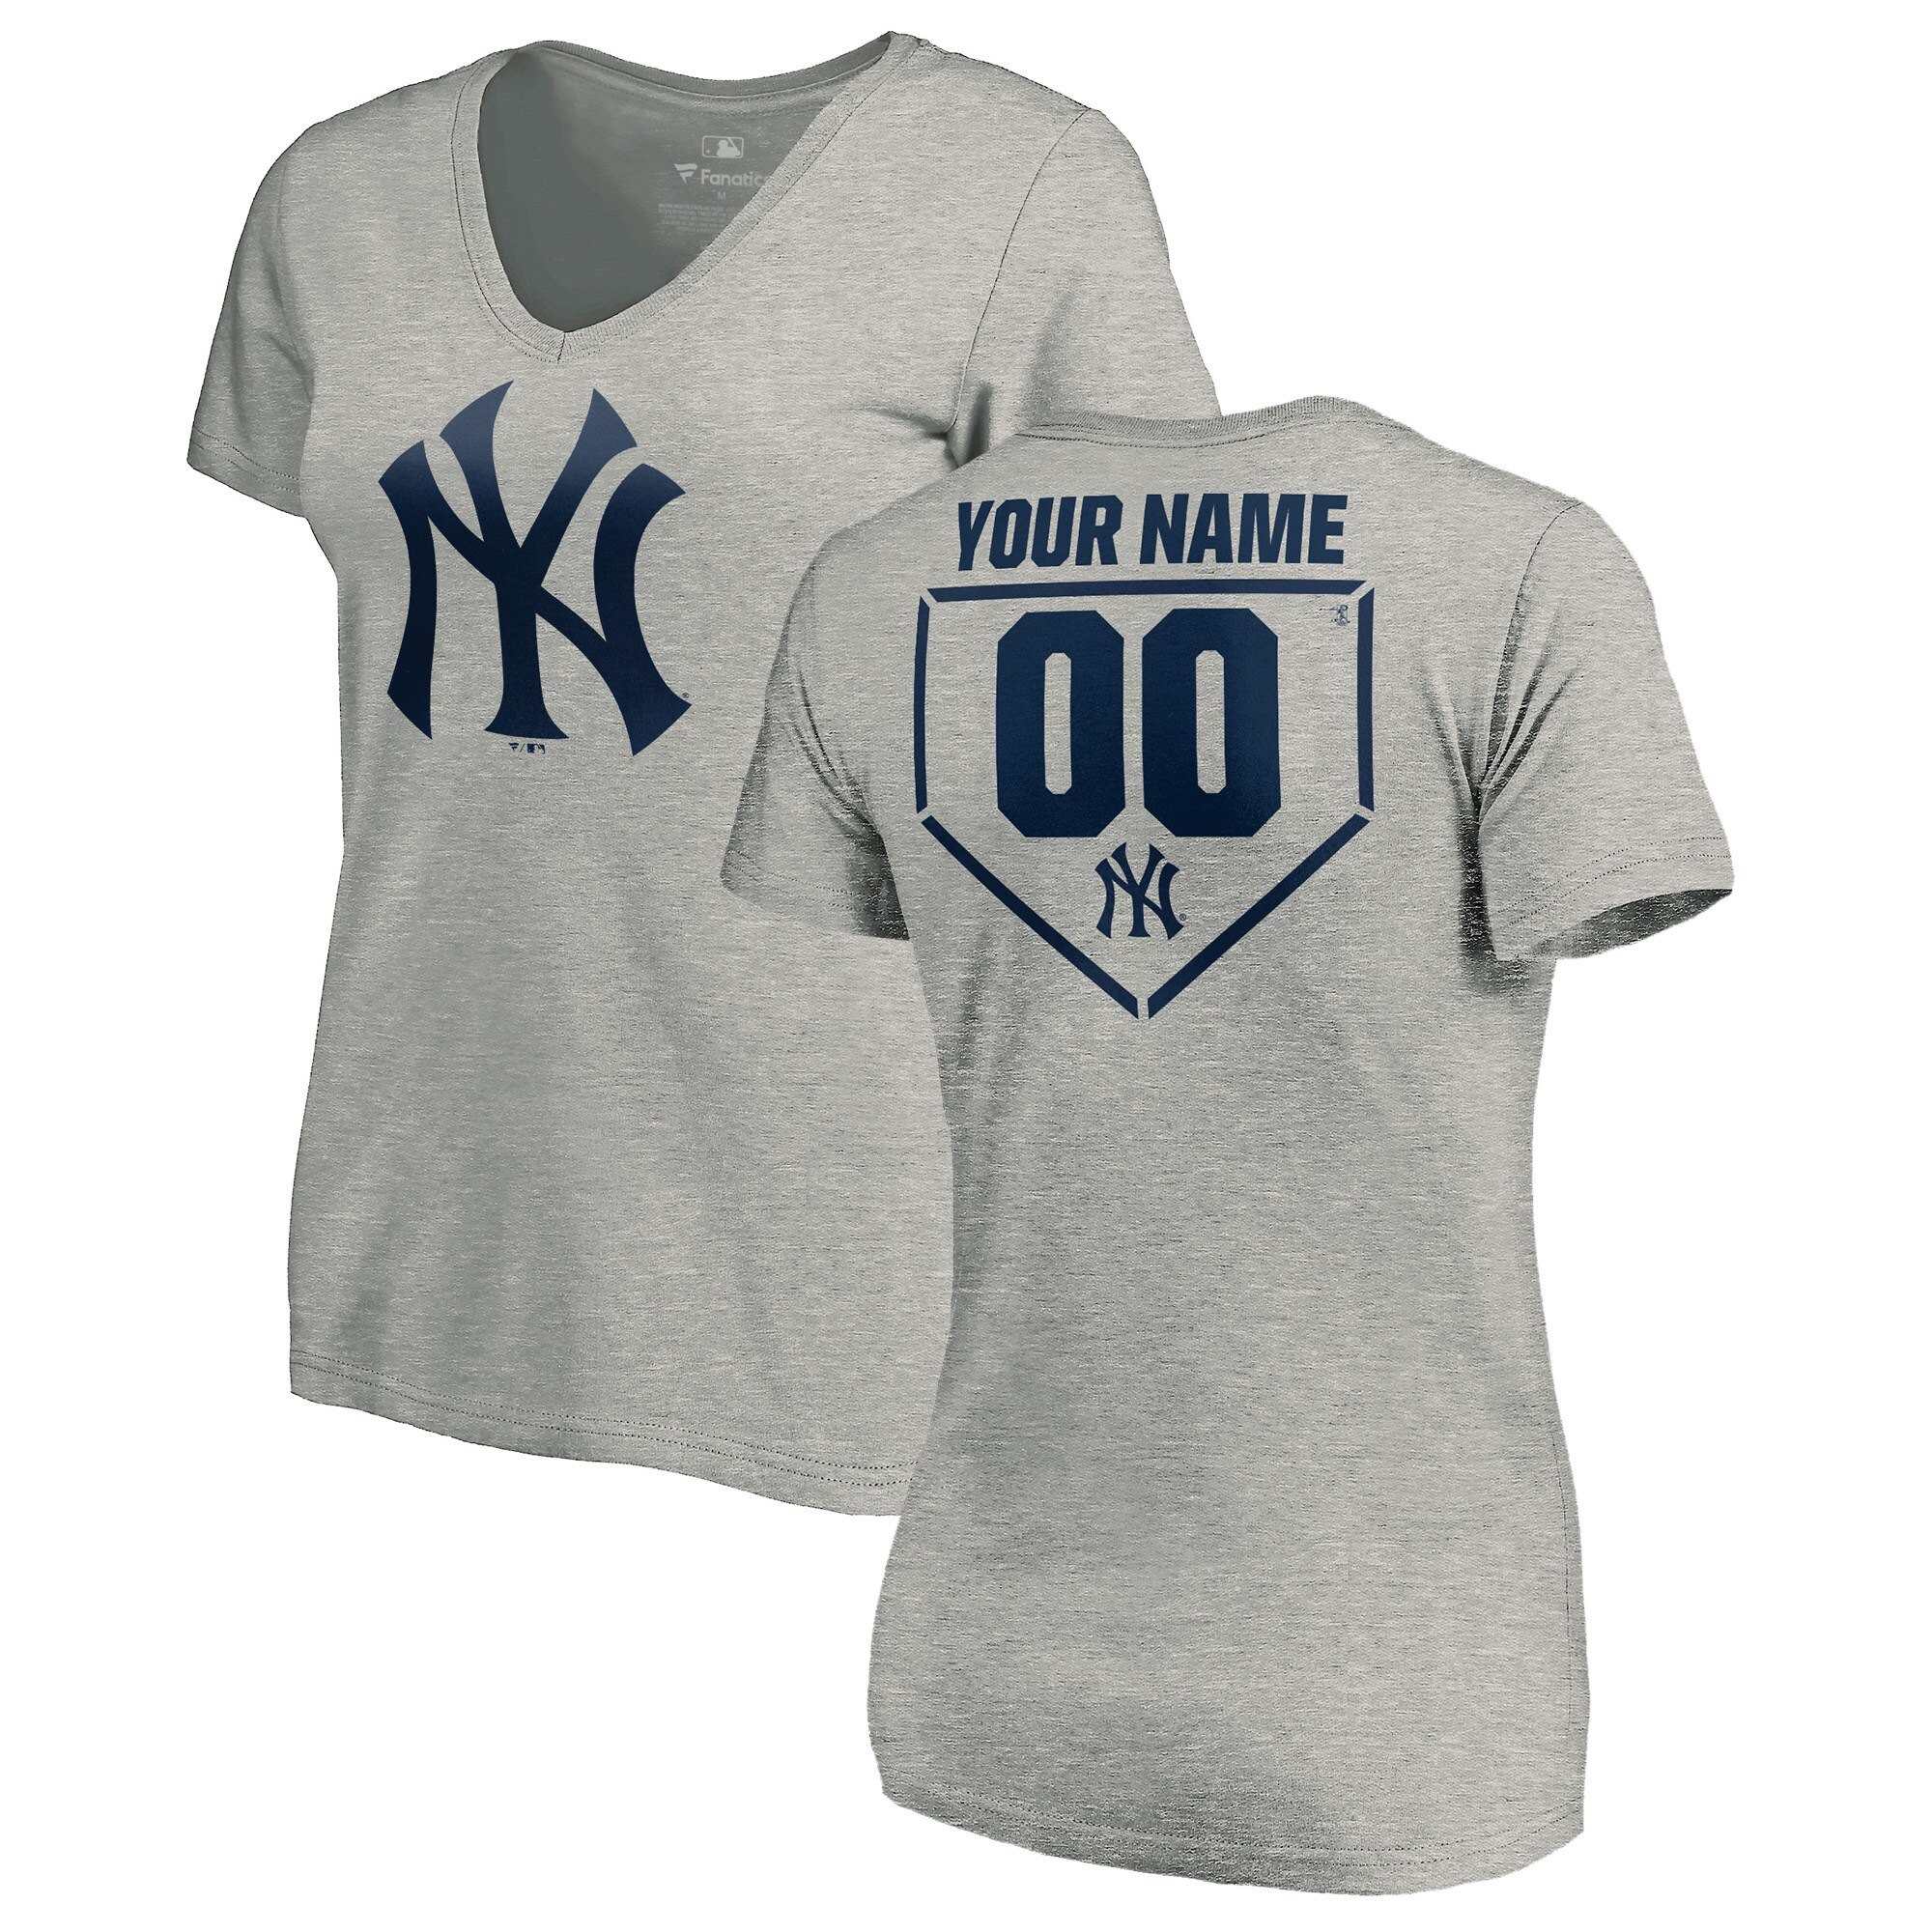 New York Yankees Fanatics Branded Women's Personalized RBI Slim Fit V-Neck T-Shirt - Heathered Gray